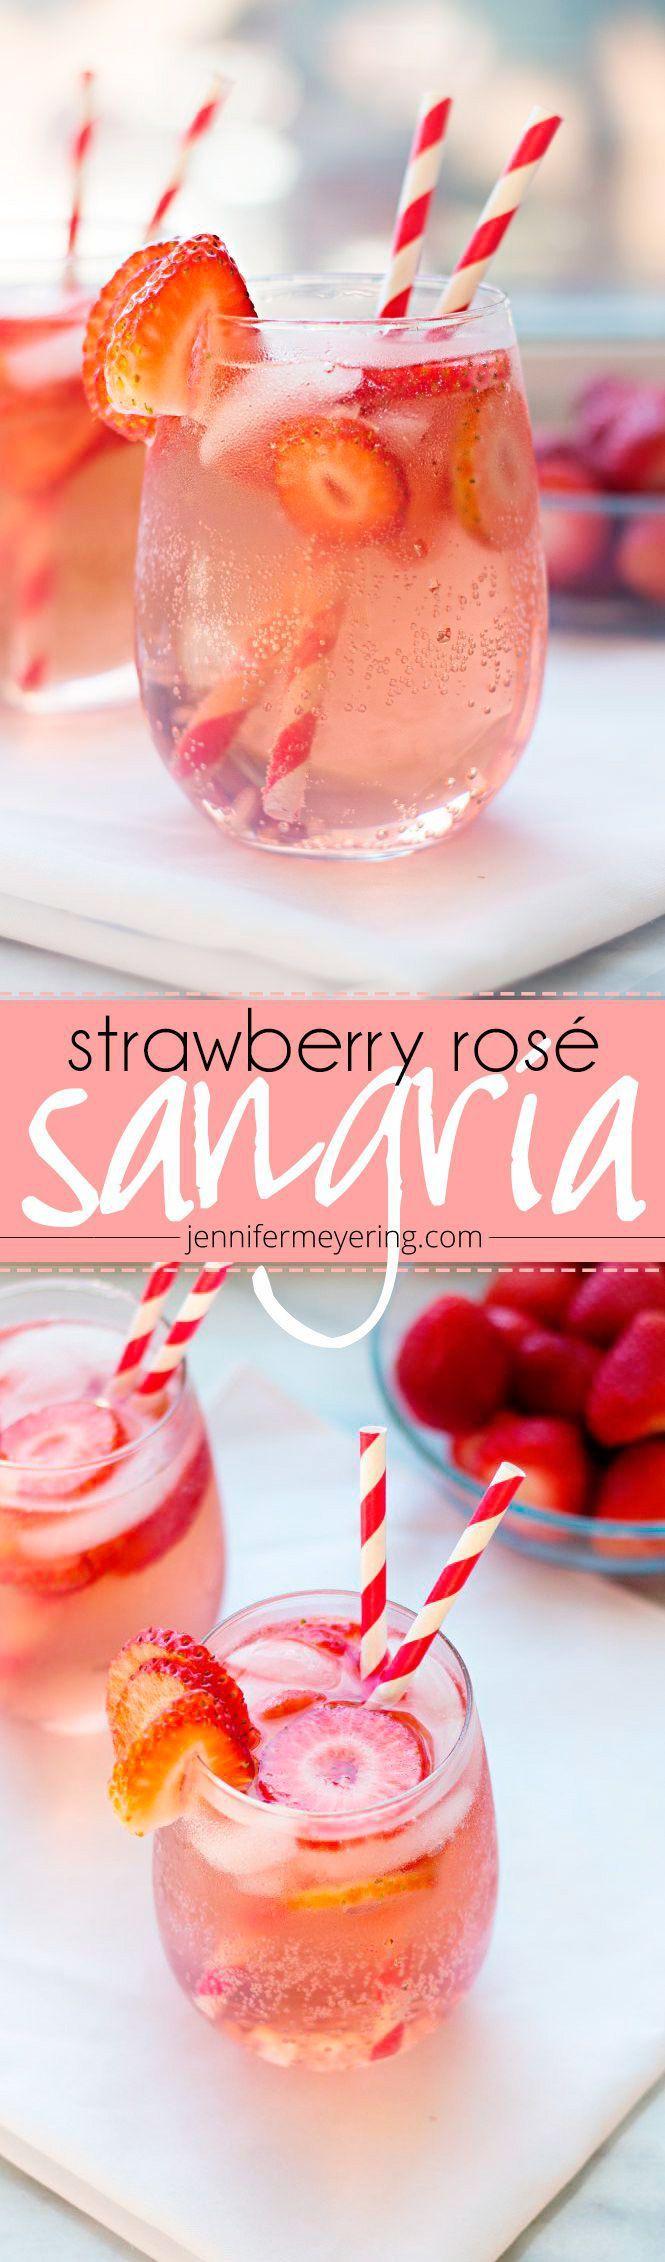 Strawberry Ros Sangria | JenniferMeyering.com